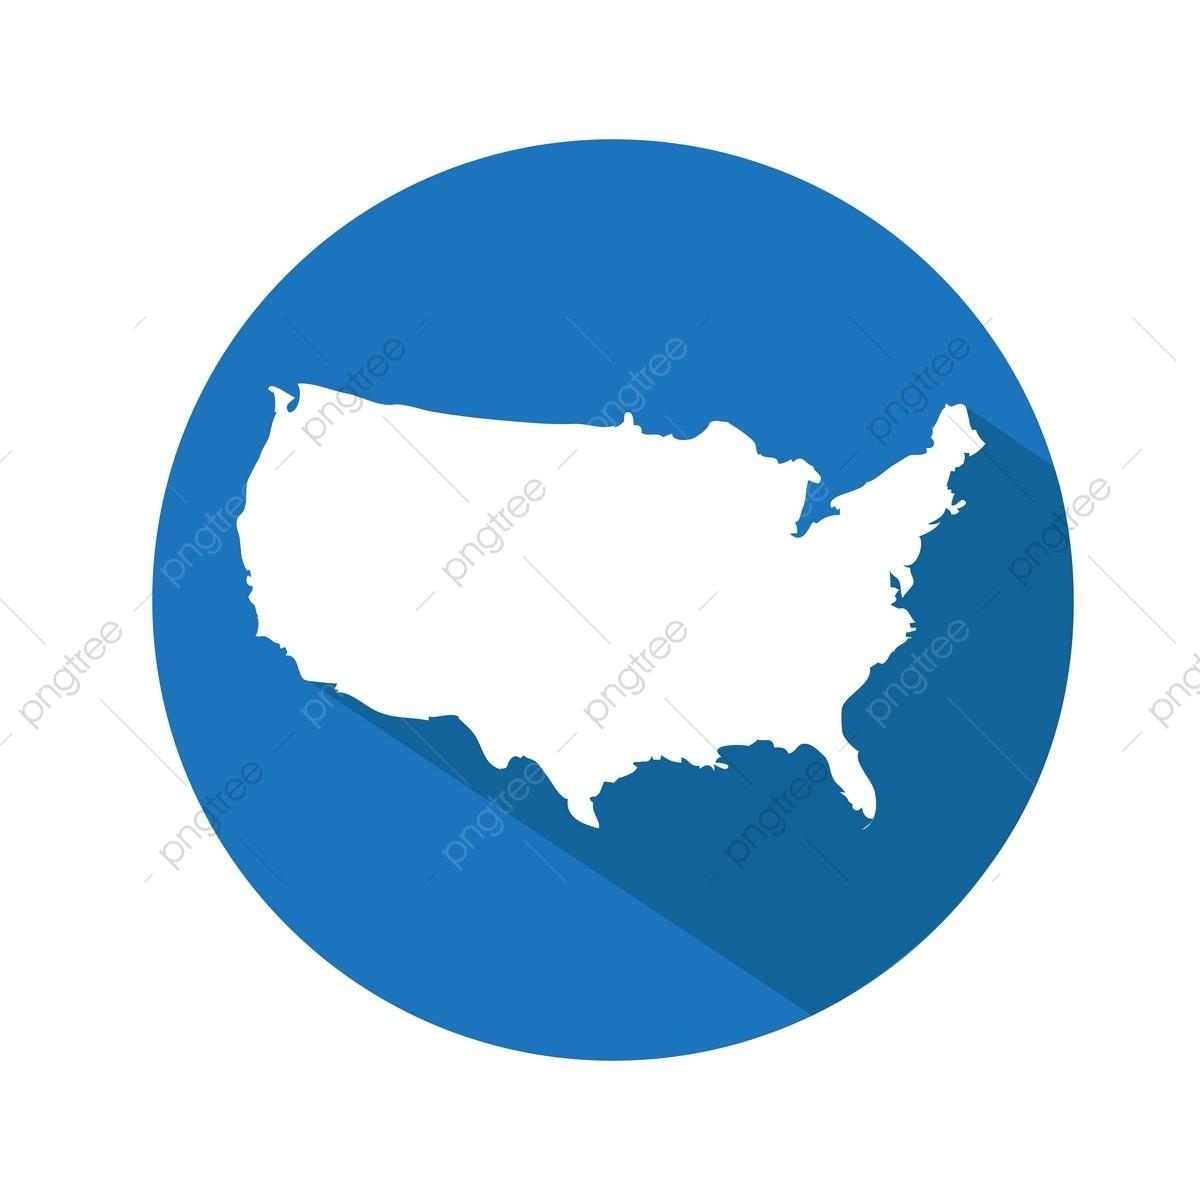 Usa Karte Amerika Amerikanischer Kunst Blog Png Und Vektor